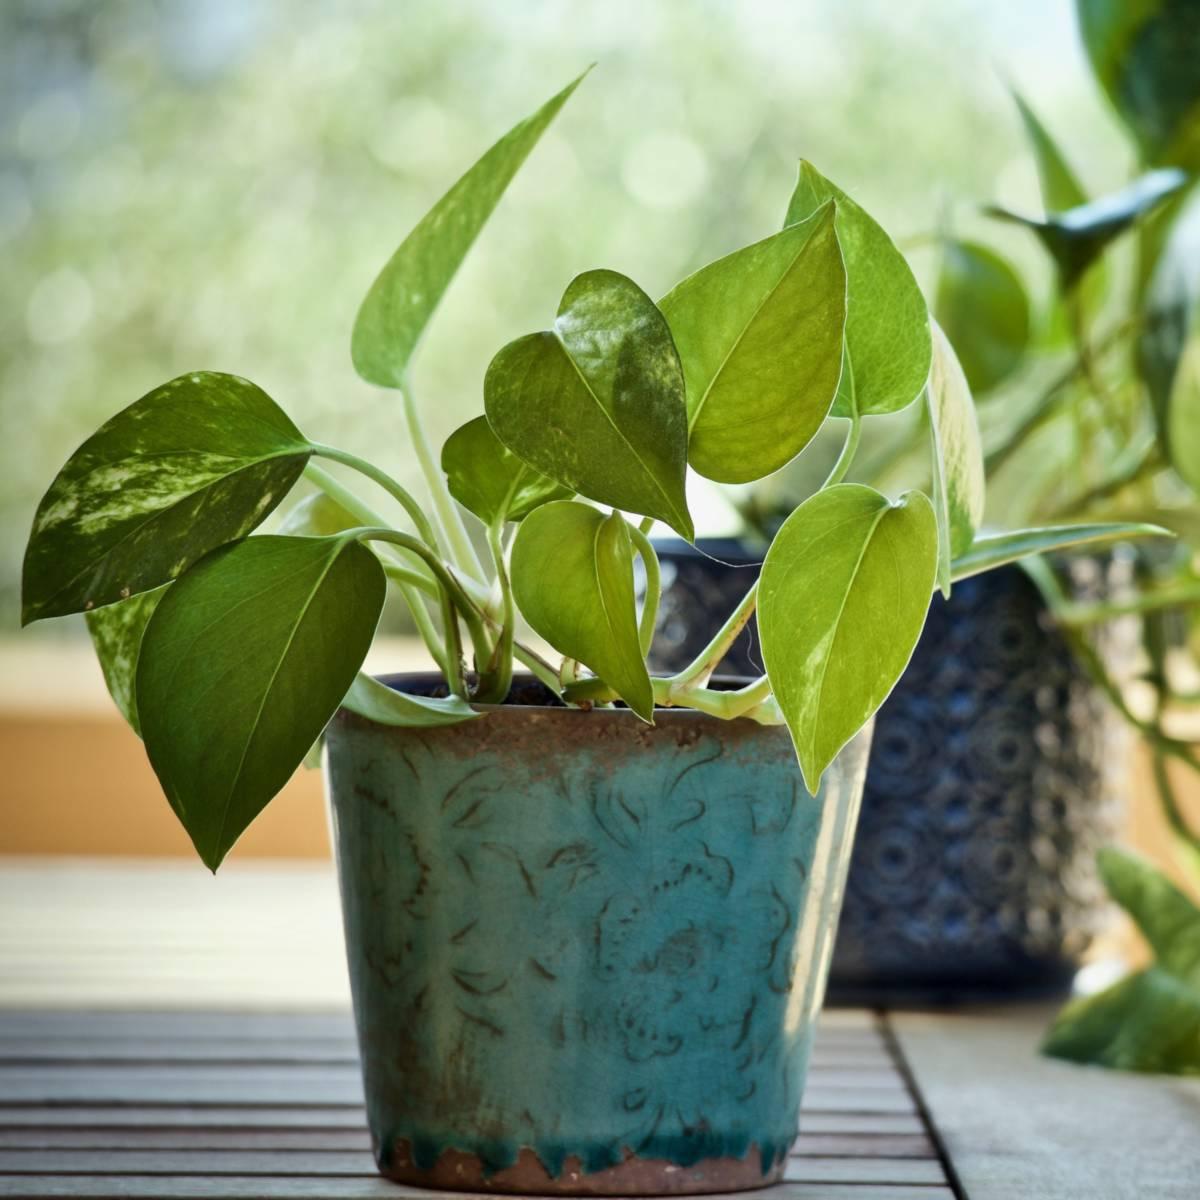 20 extraordinary bathroom plants – moisture loving survivor beauties